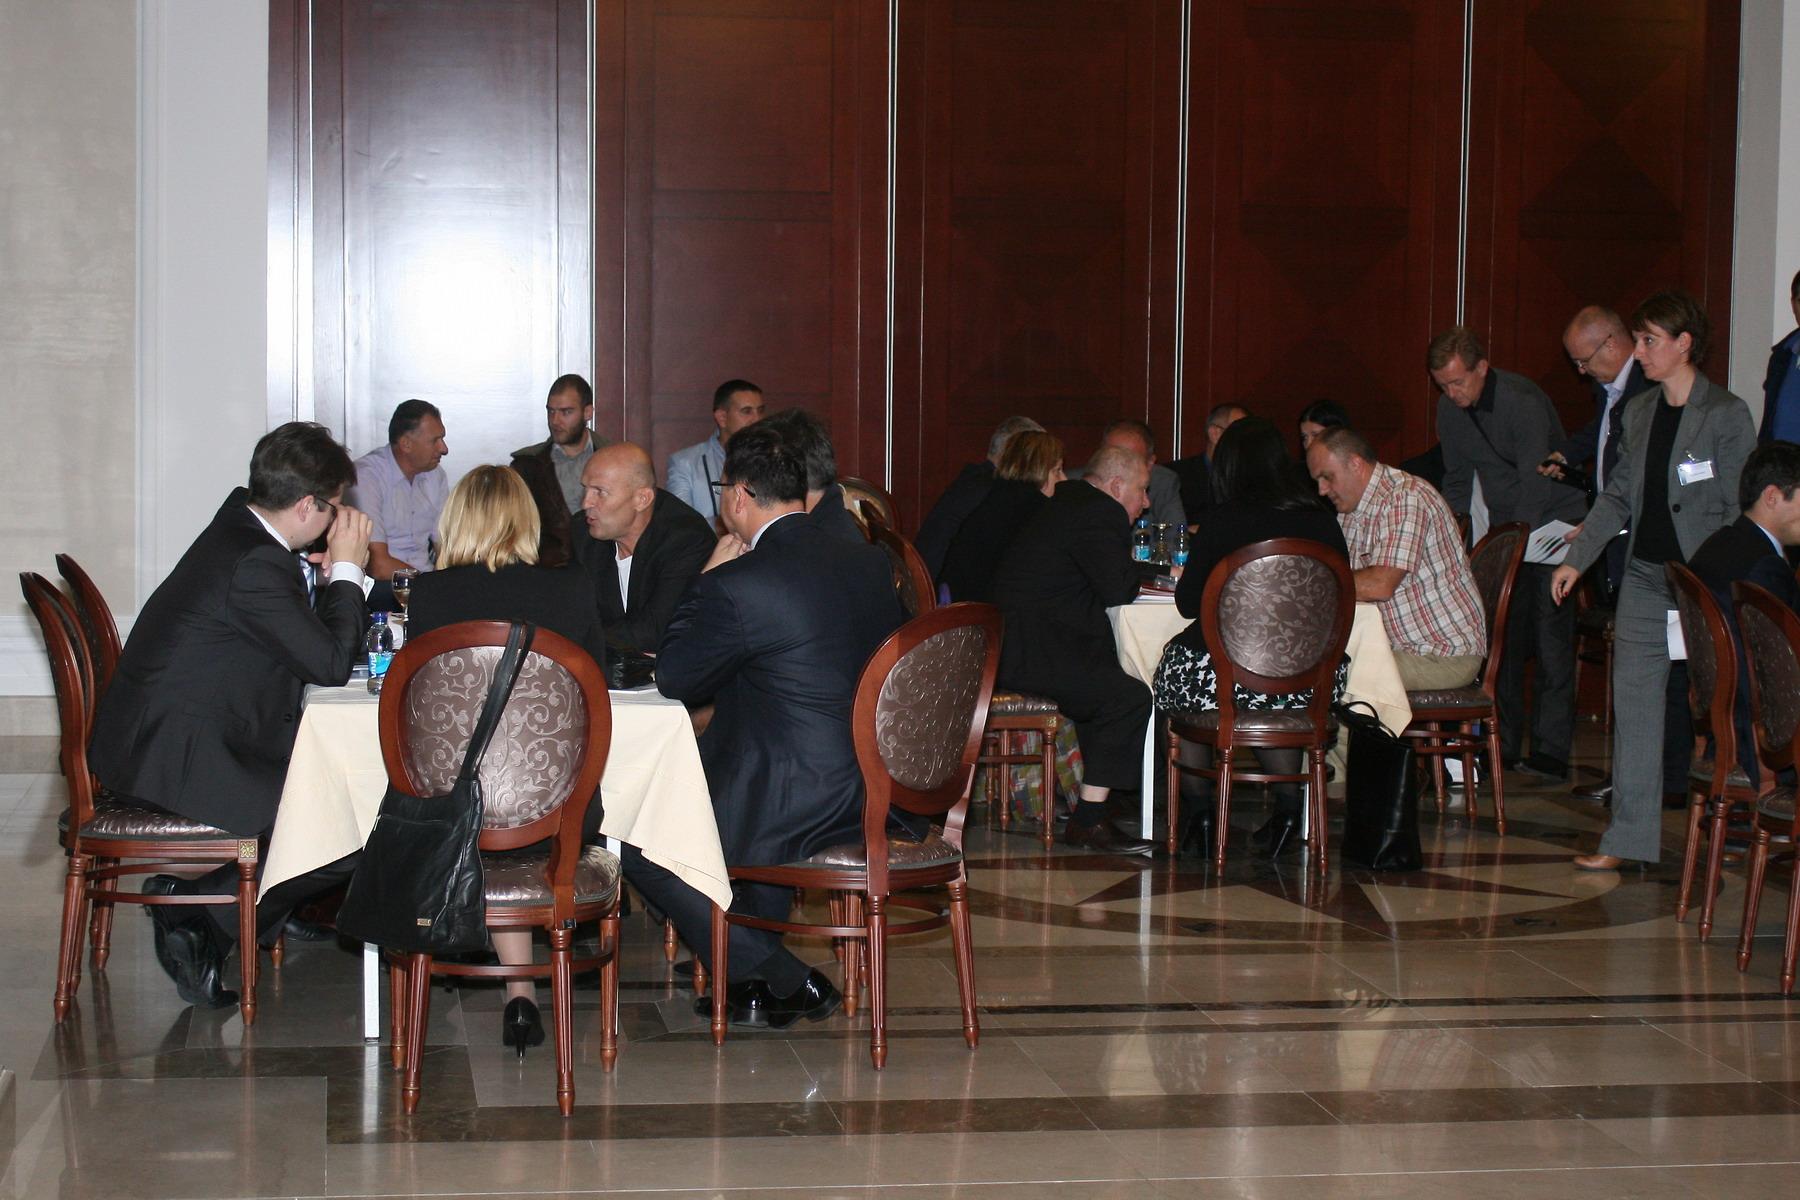 Republic of Srpska and Sankt Petersburg business people met in Banja Luka